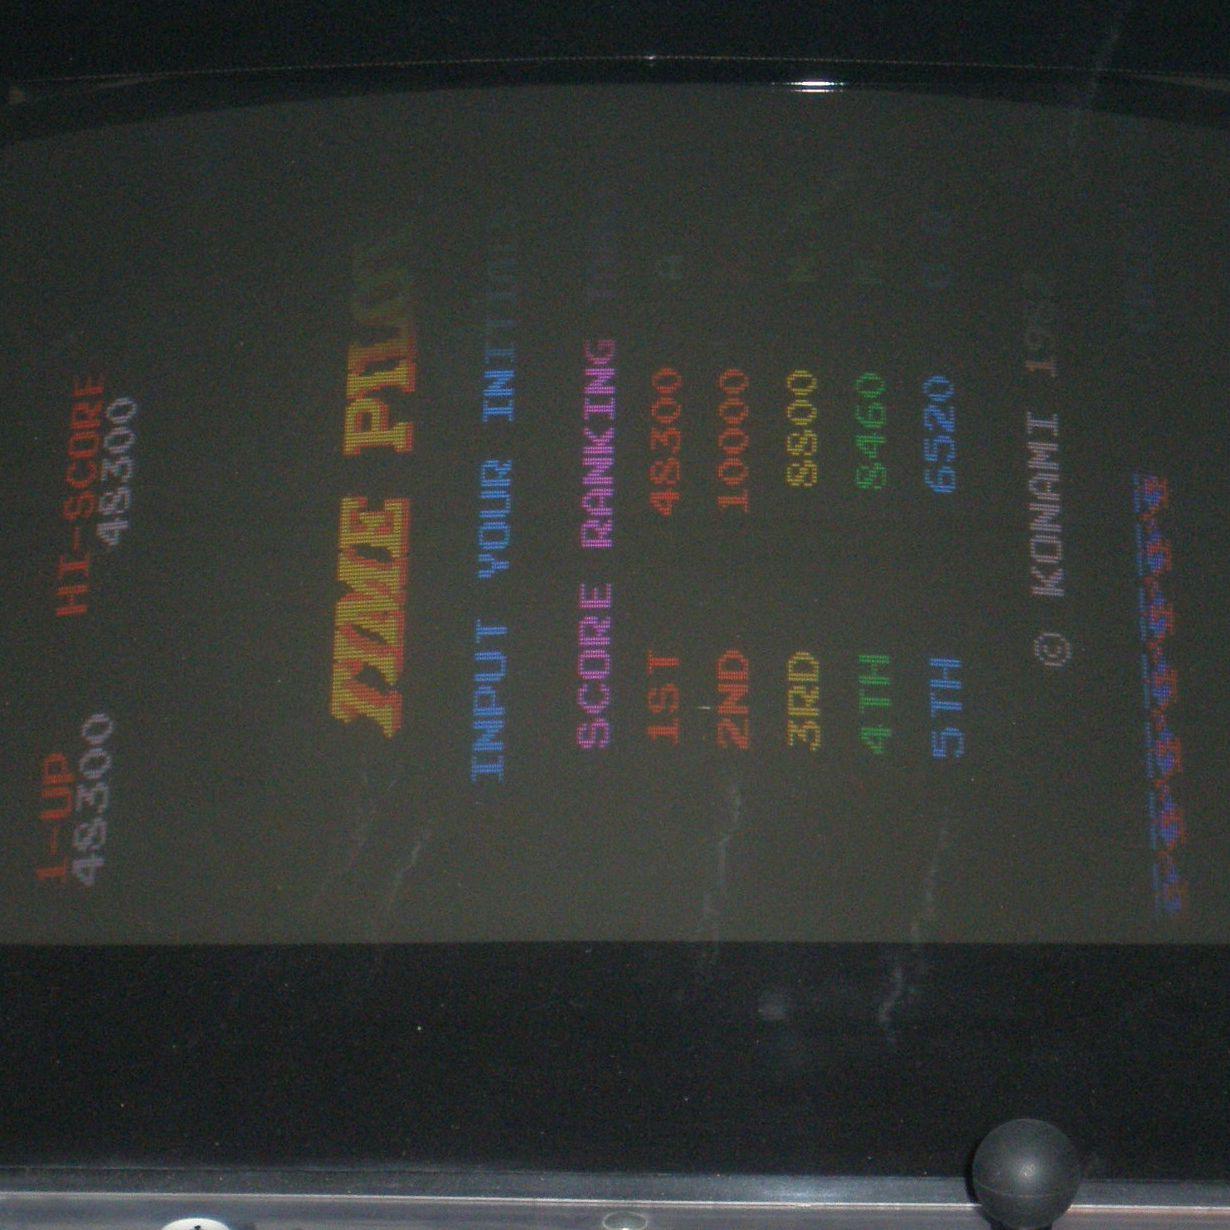 http://arcadius.esero.net/Arcade/Games/Non_Jamma_Fully_Working/Time_Pilot_04.jpg